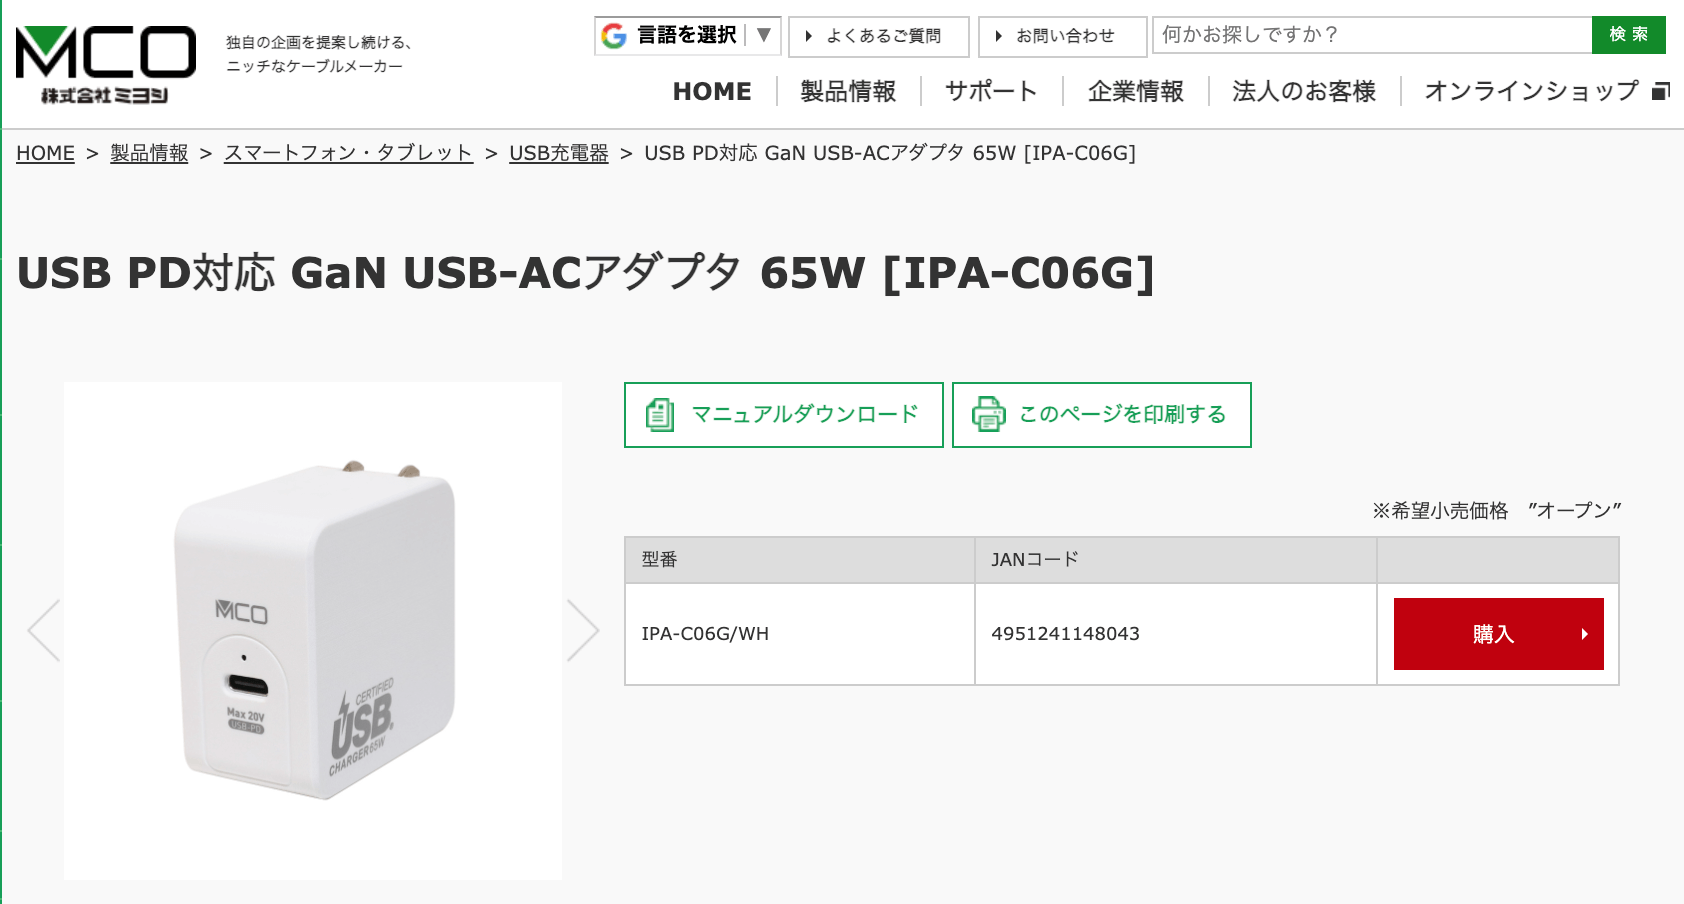 USB PD対応 GaN USB-ACアダプタ 65W